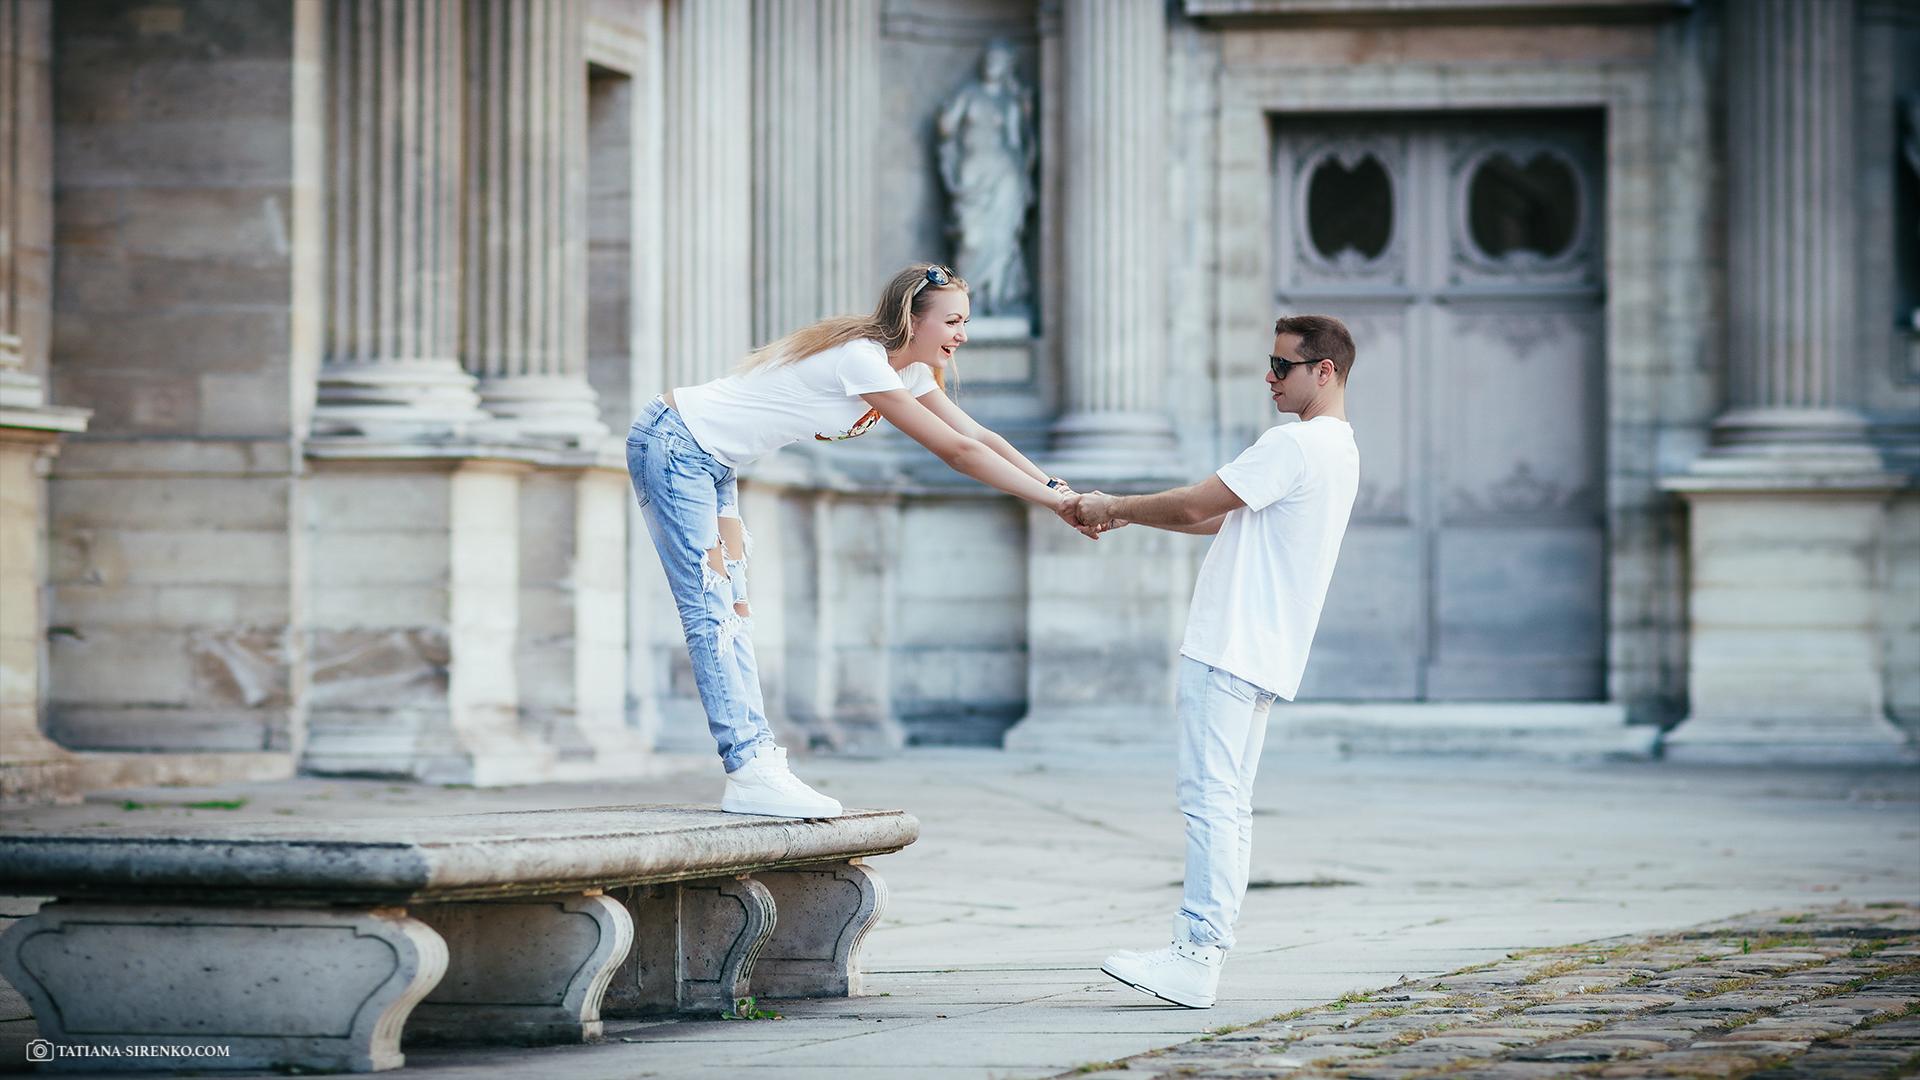 Love Story in France